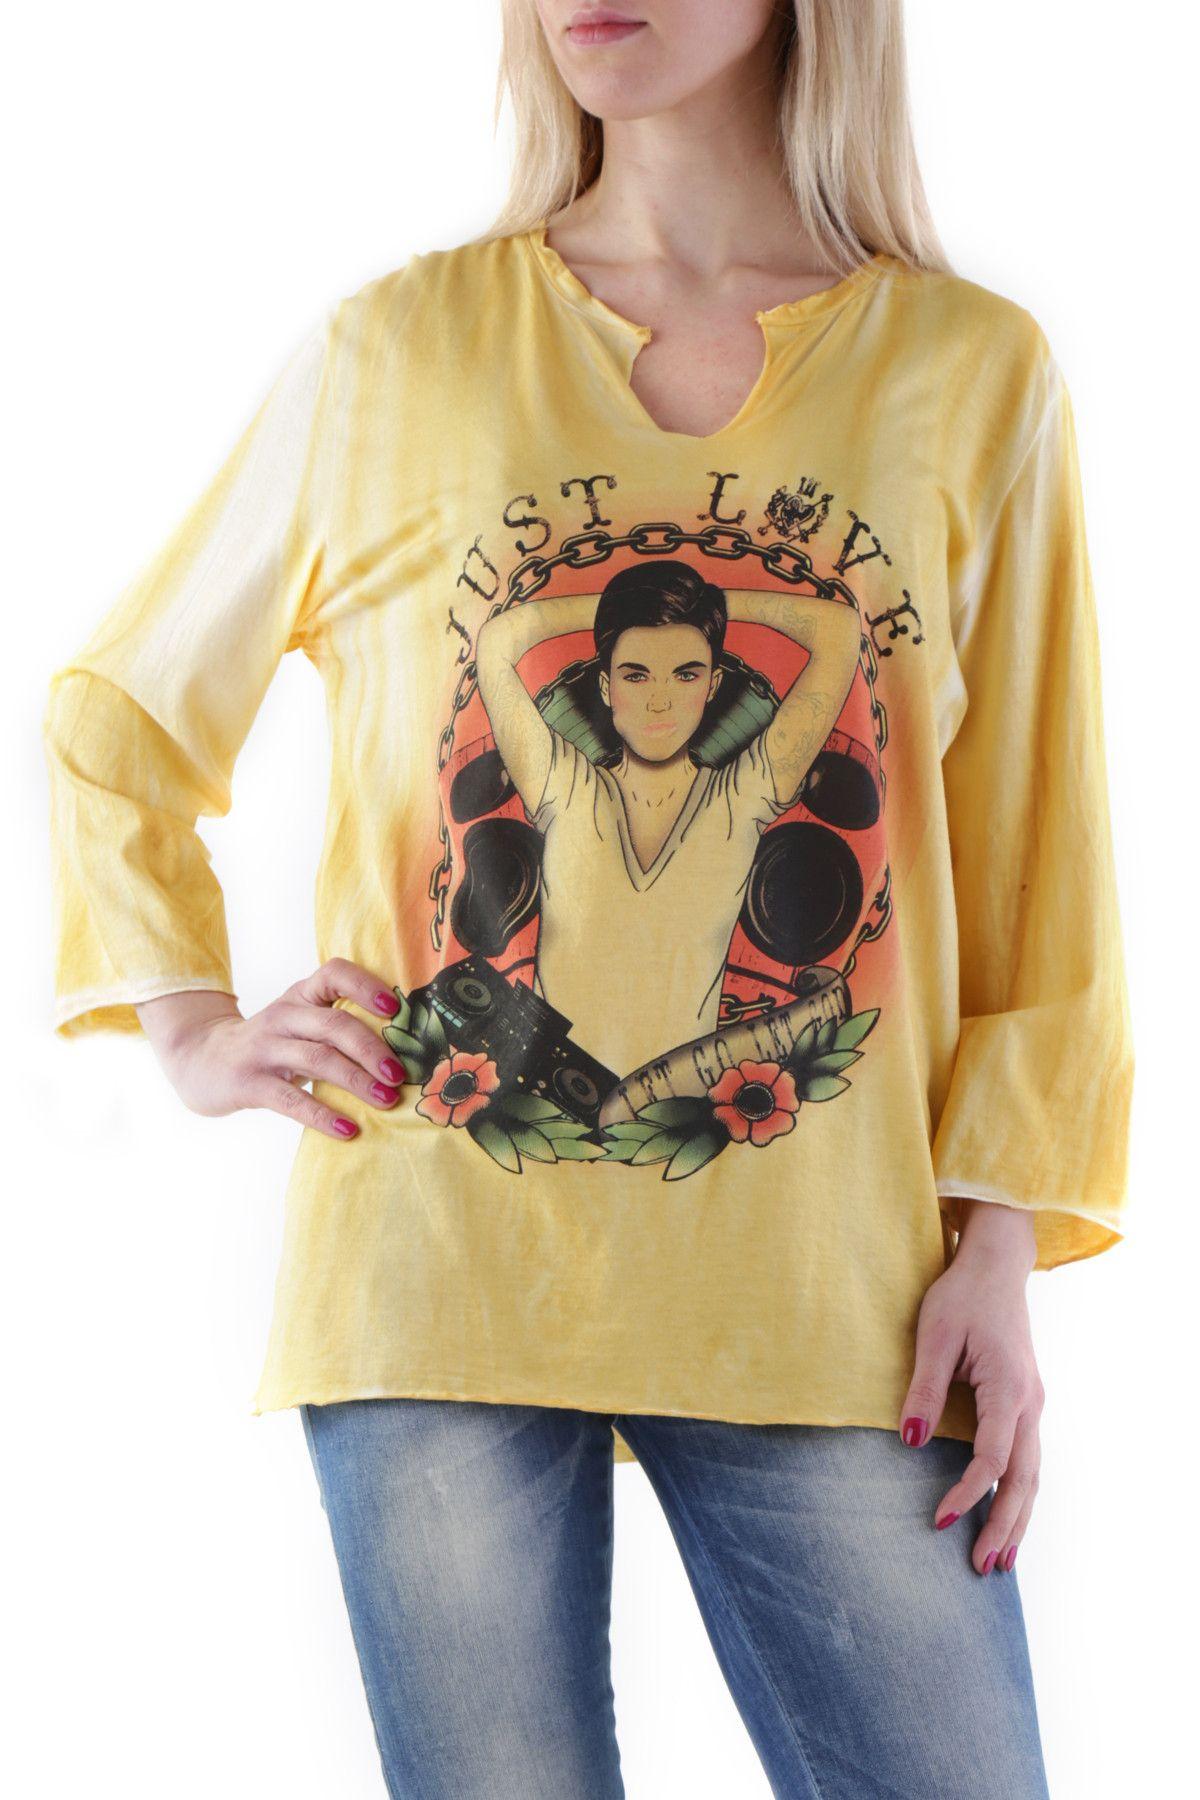 525 Women's T-Shirt In Yellow